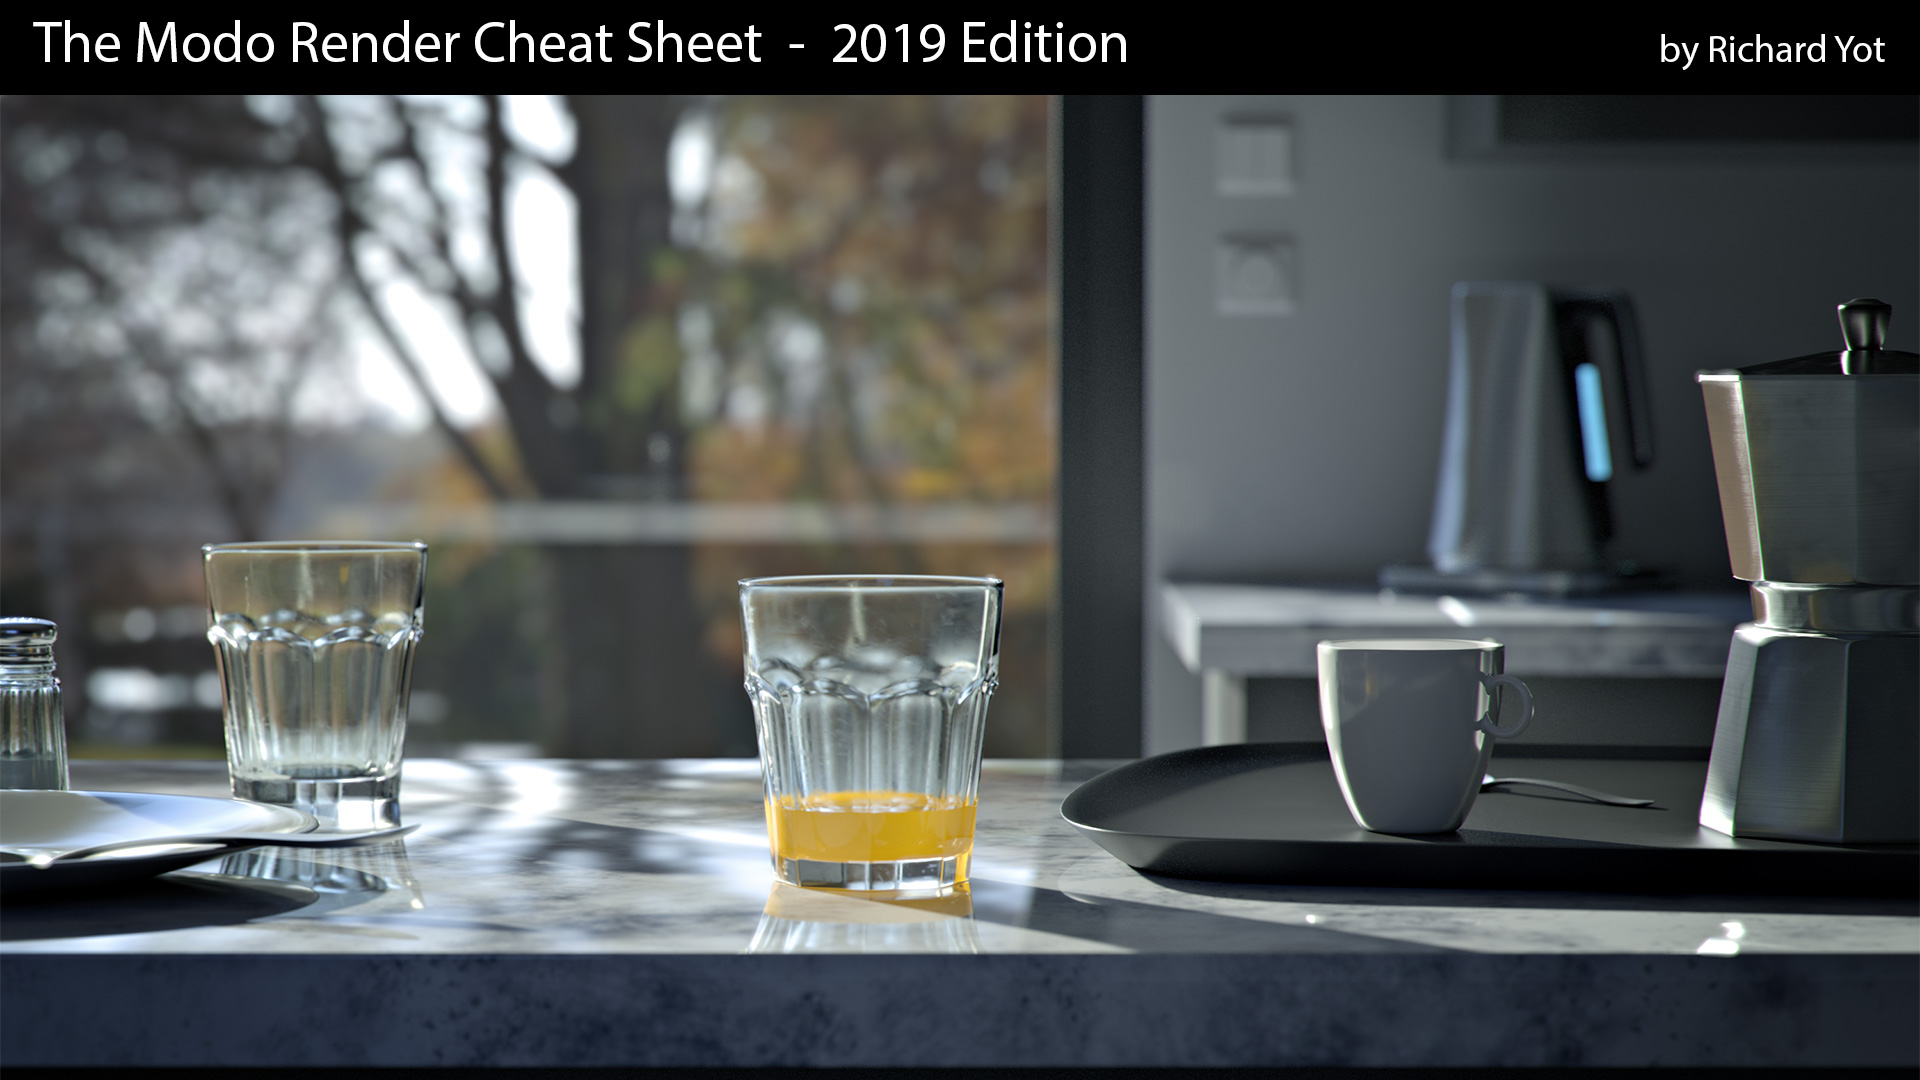 cheat-sheet-1080.jpg